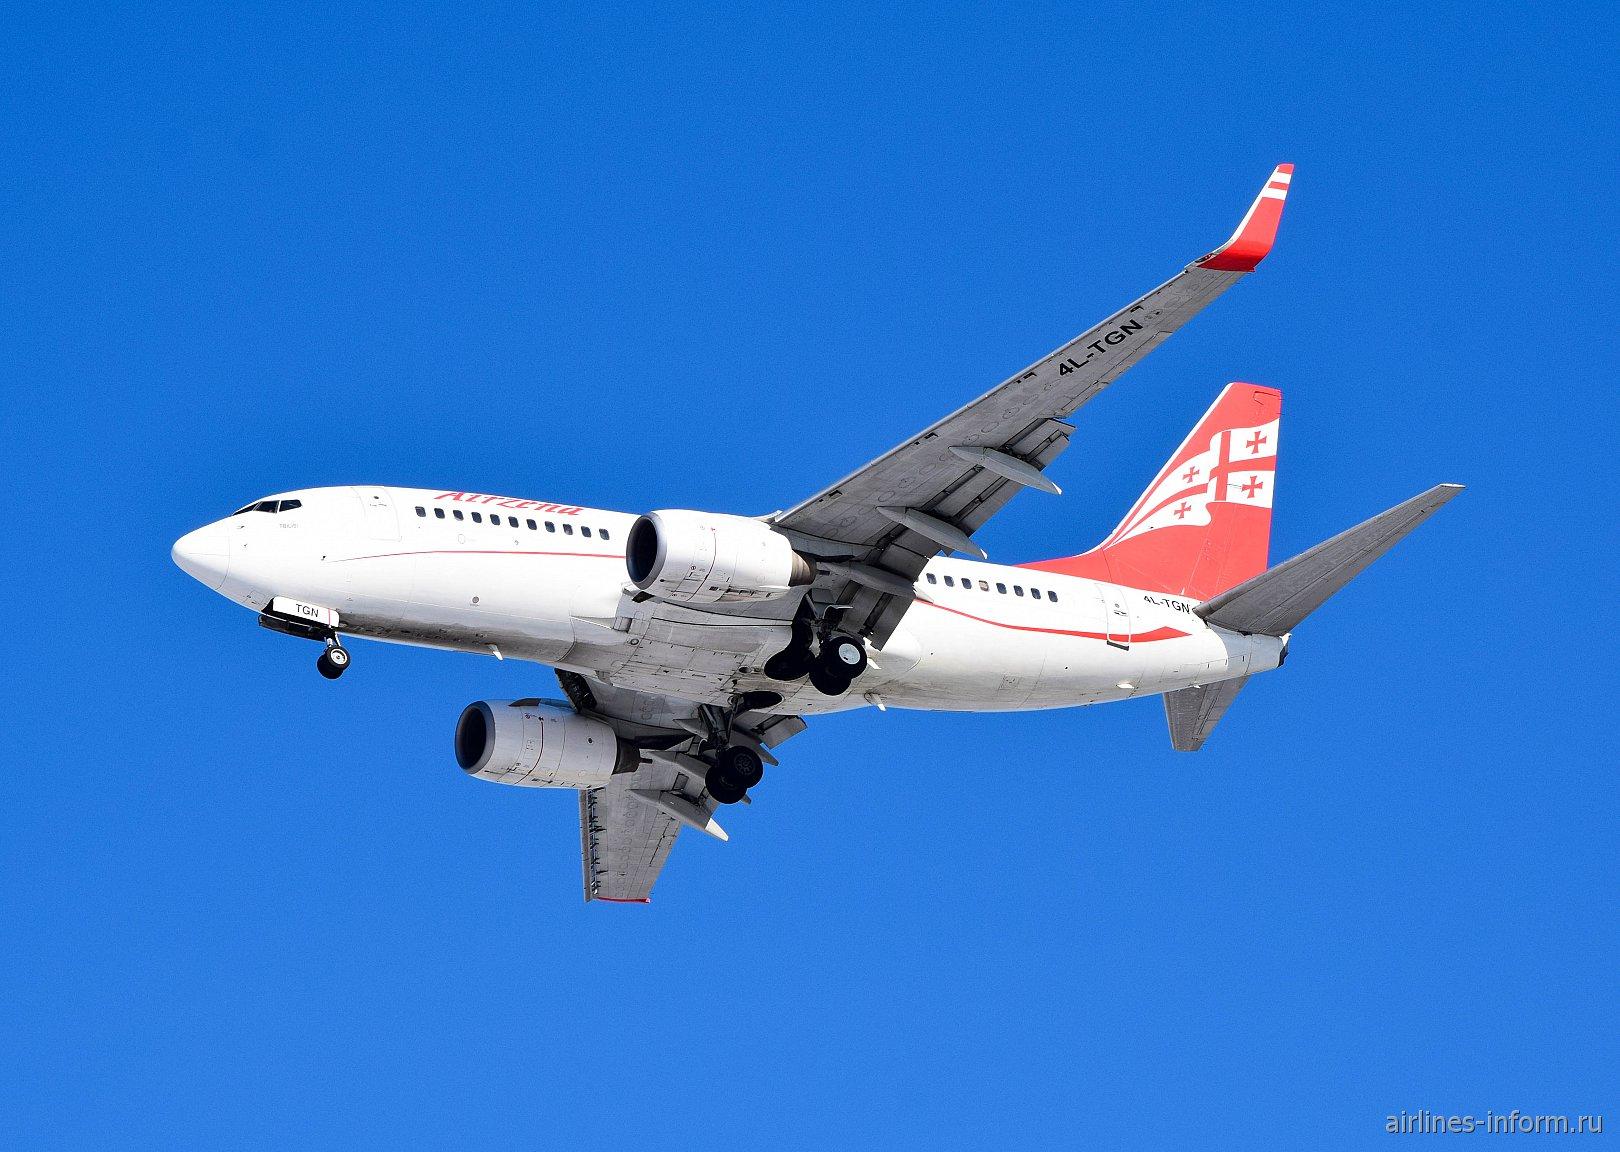 Боинг-737-700 4L-TGN авиакомпании Airzena